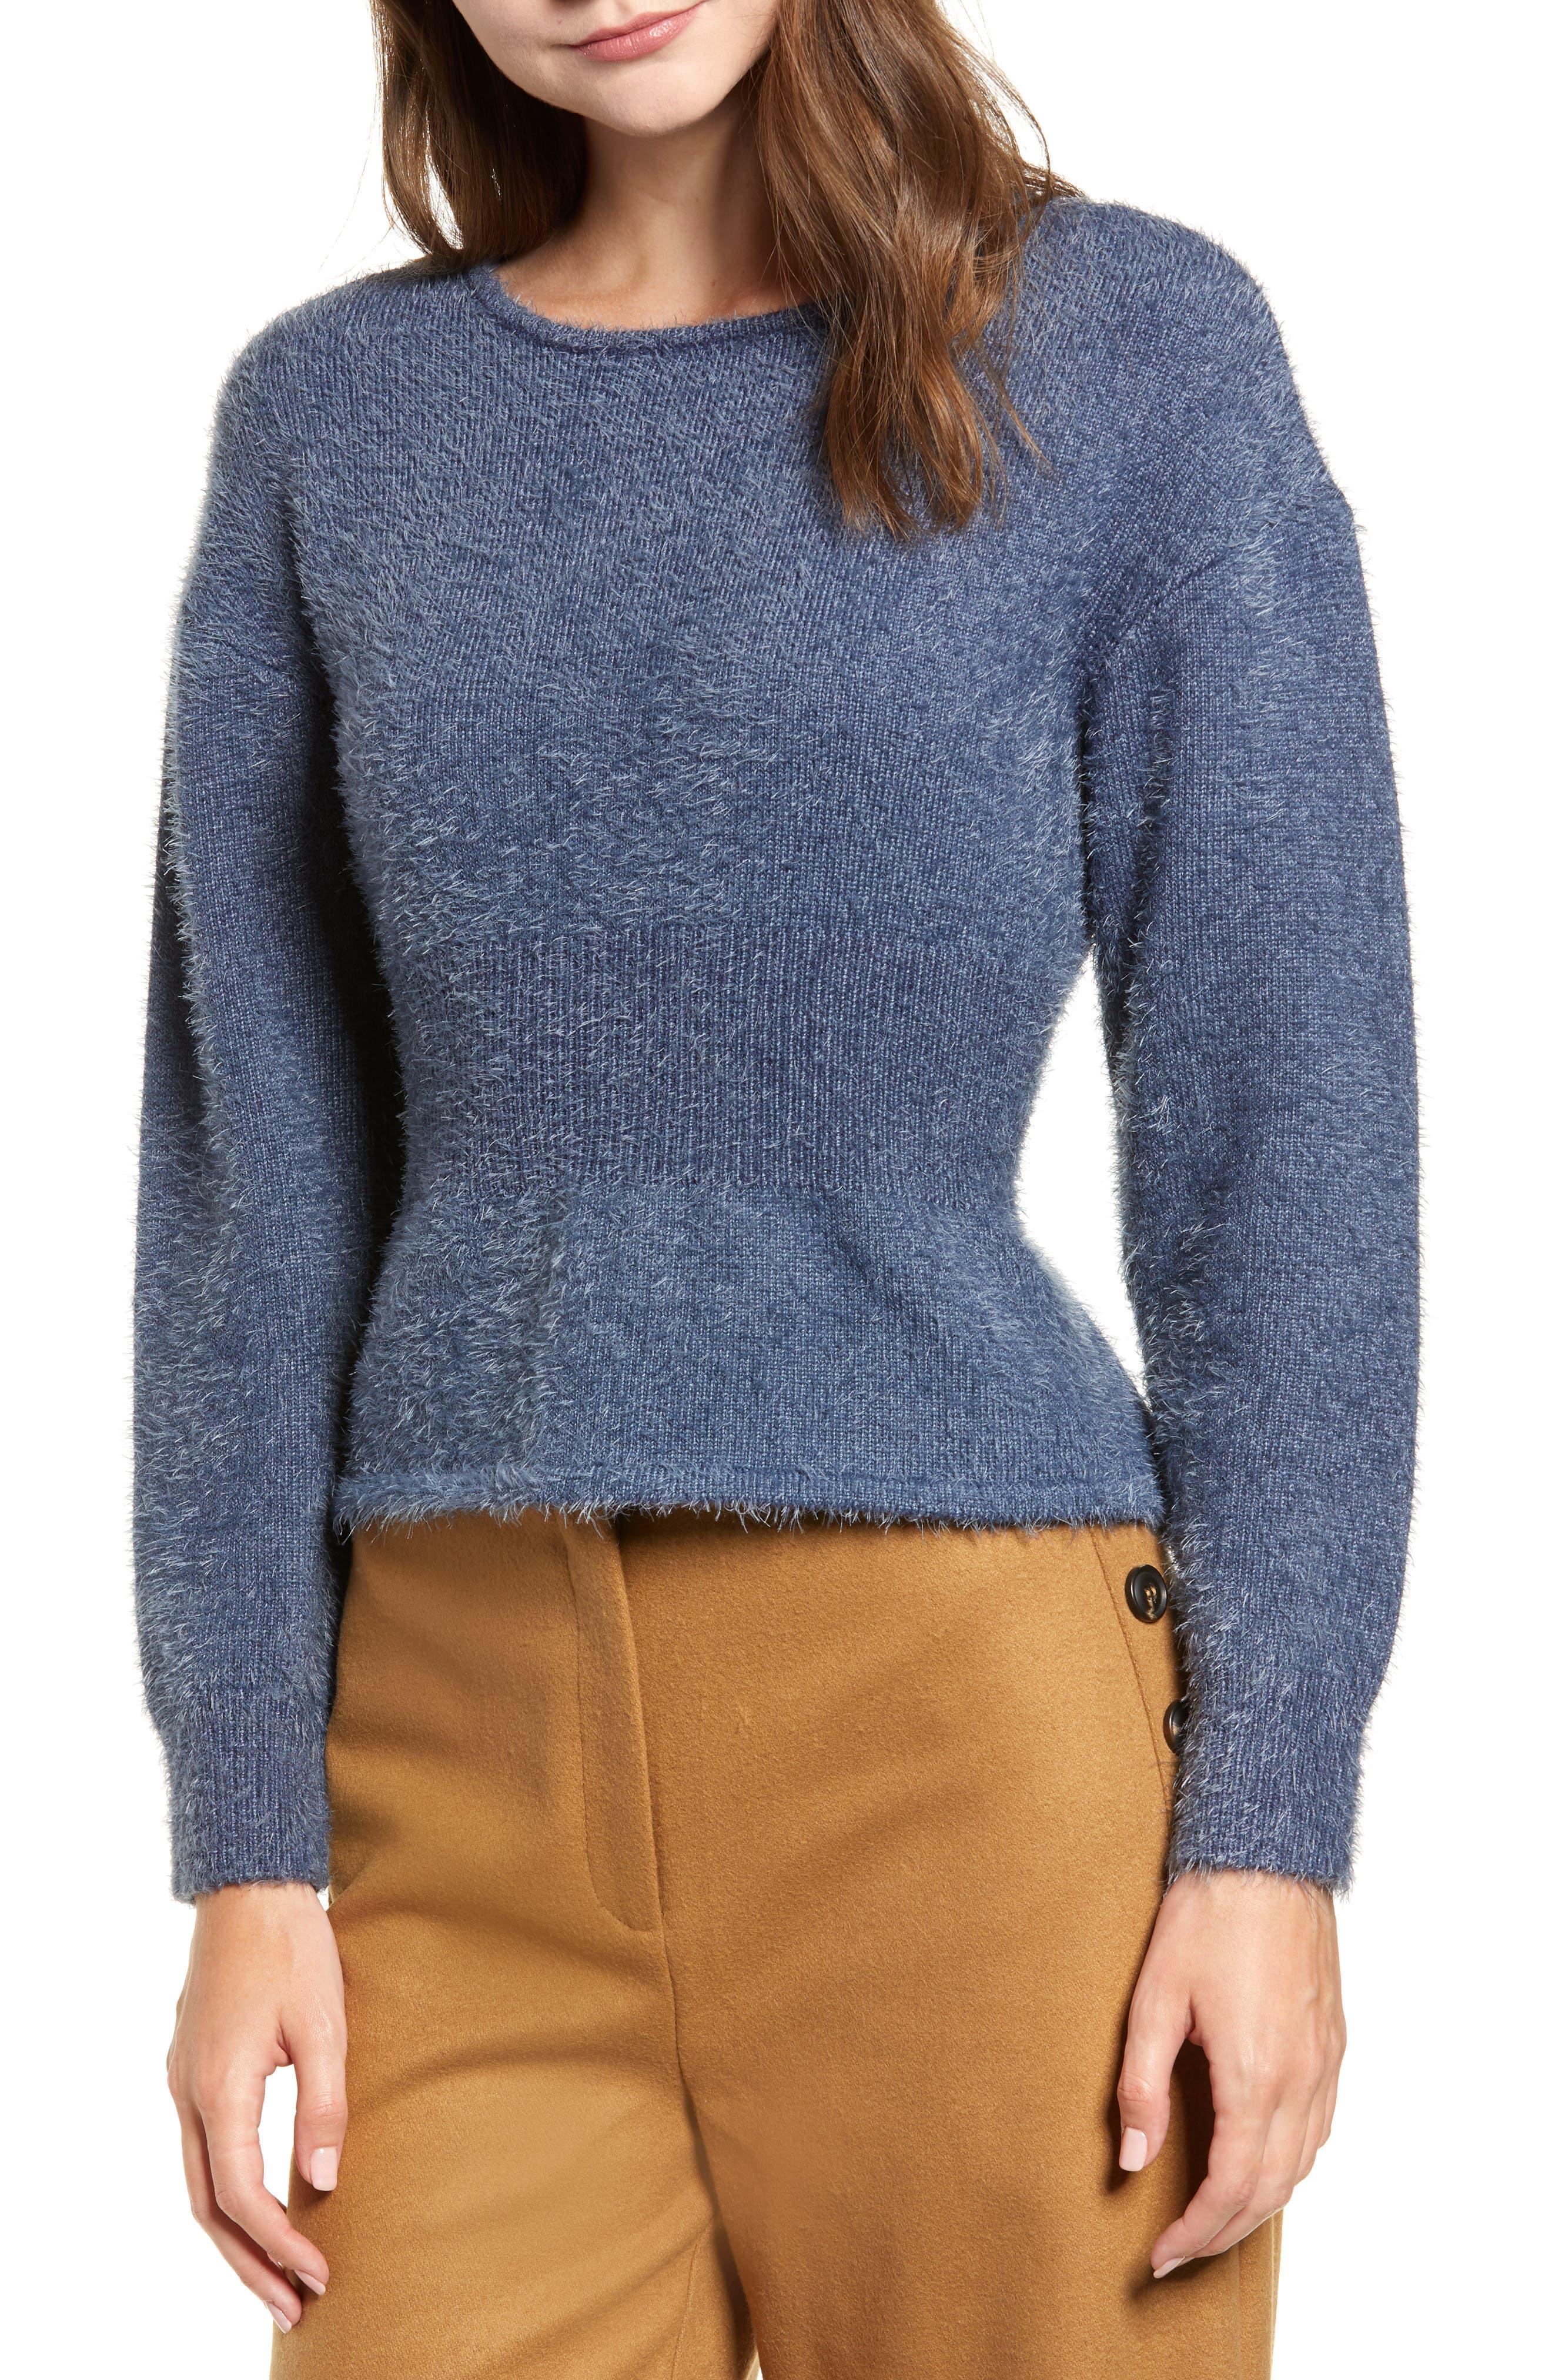 Chriselle Lim Erin Eyelash Sweater,                         Main,                         color, 400